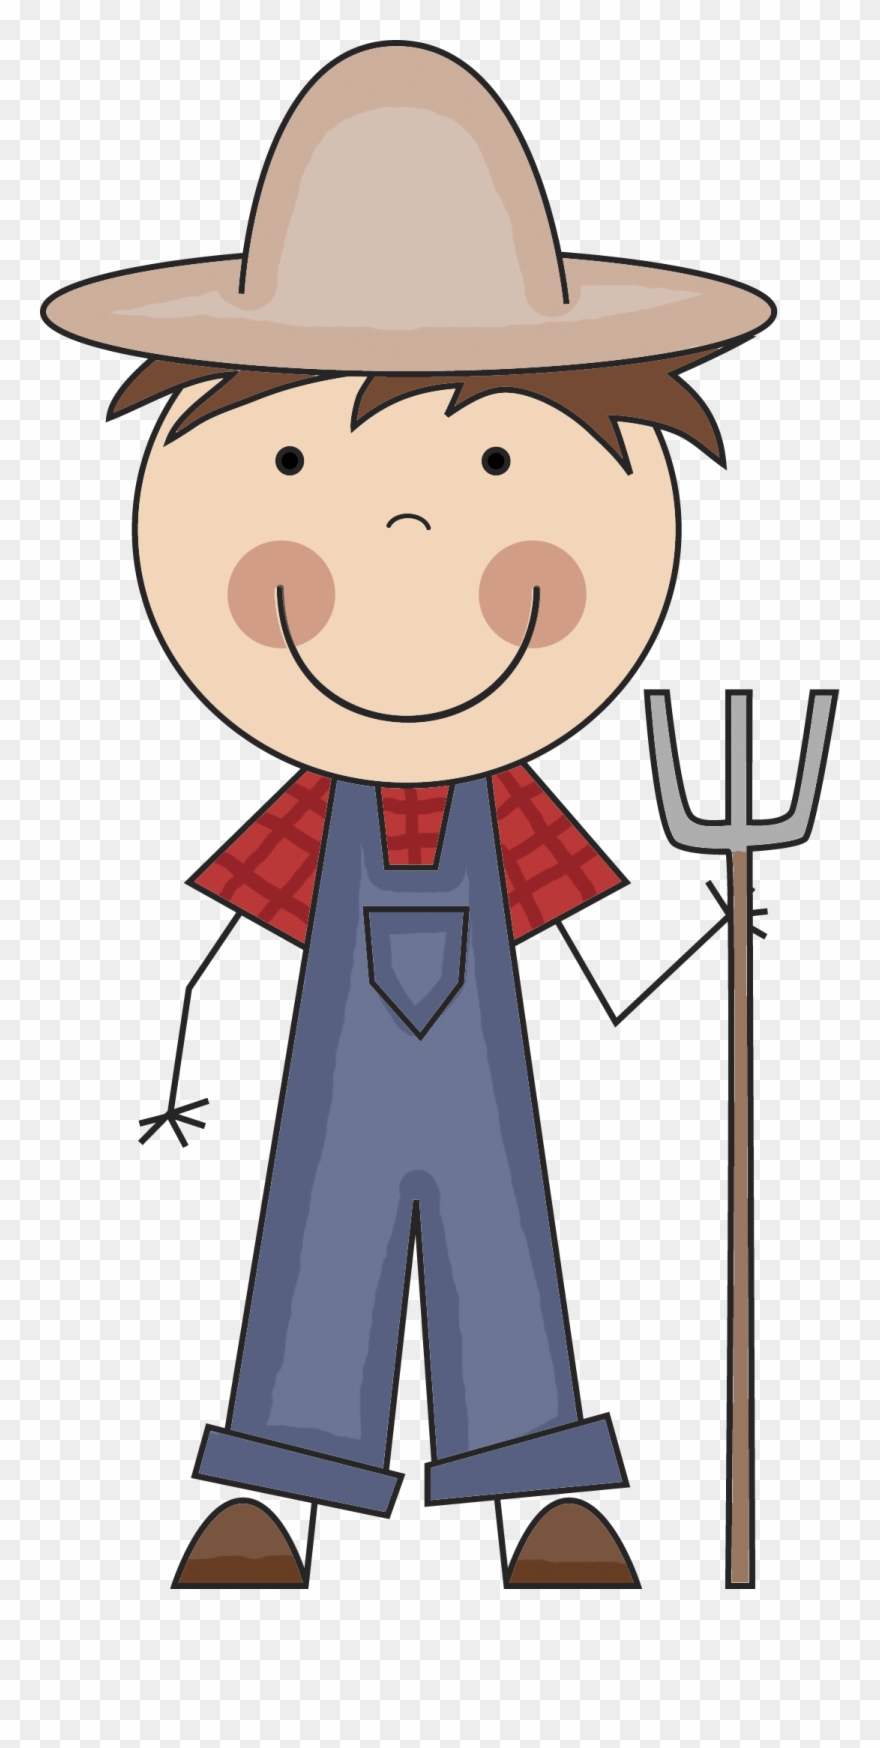 Farmer clipart producer. People cartoon farmers png